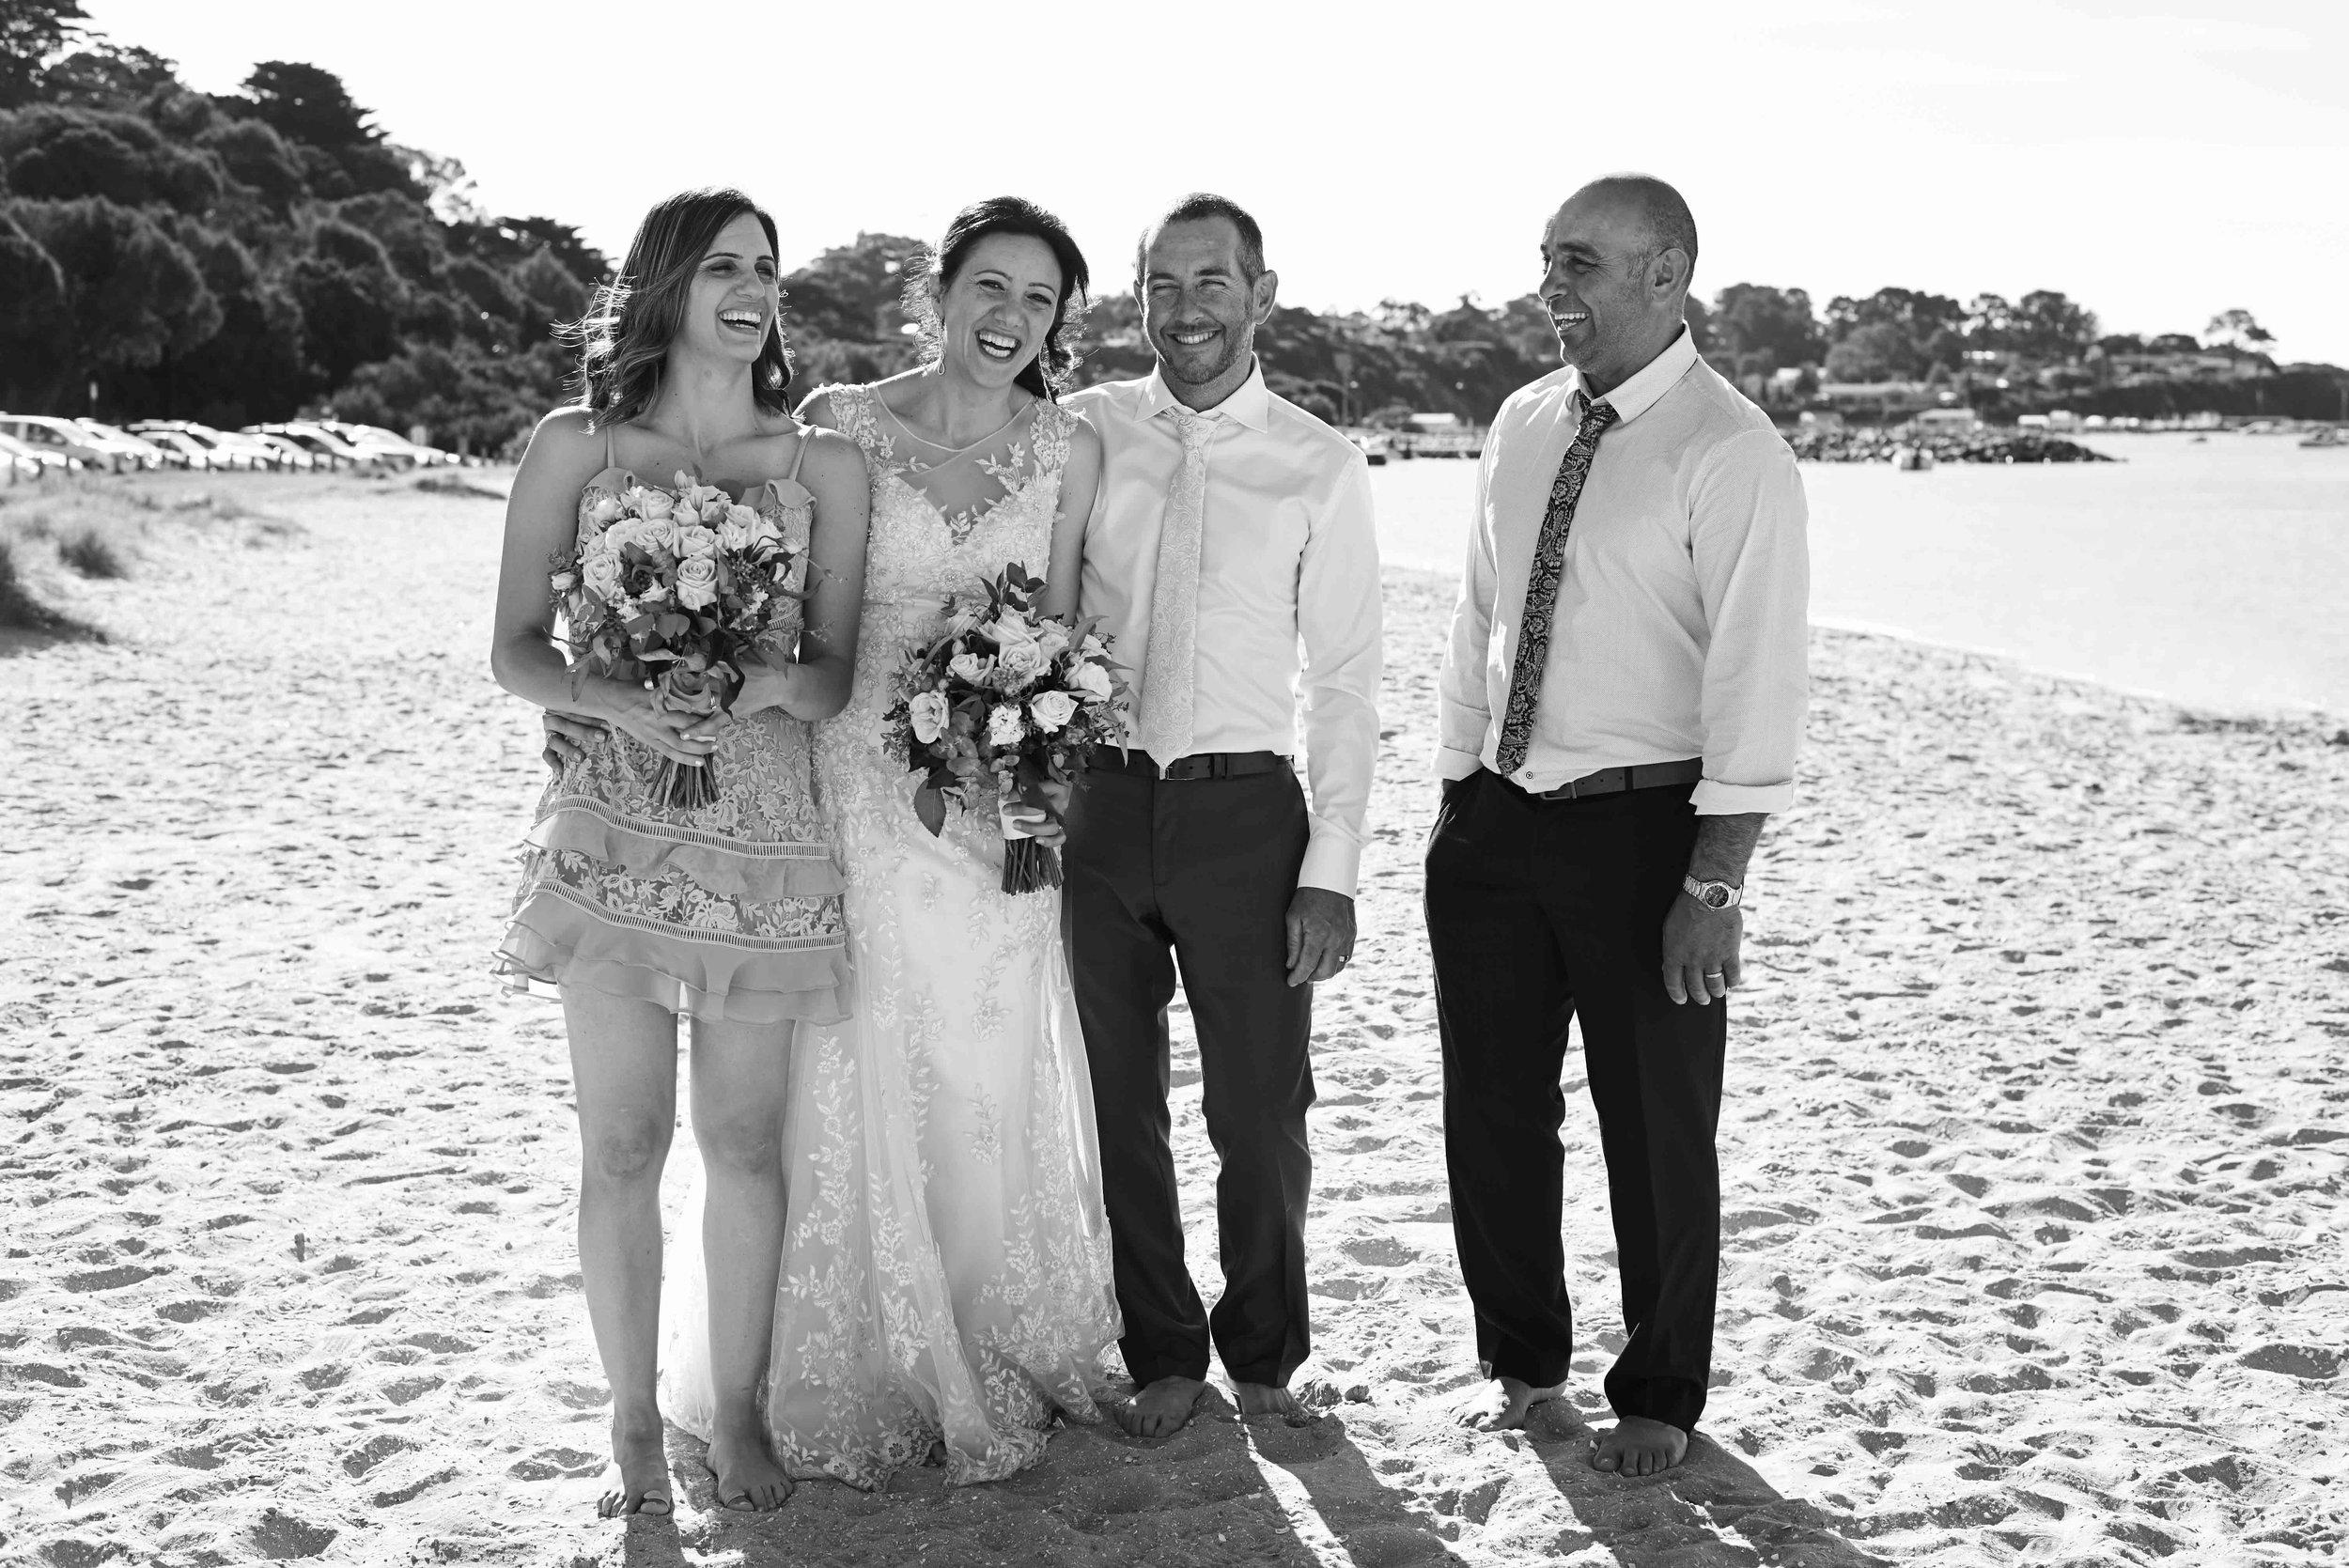 sorrento-wedding-photography-all-smiles-marissa-jade-photography-167.jpg